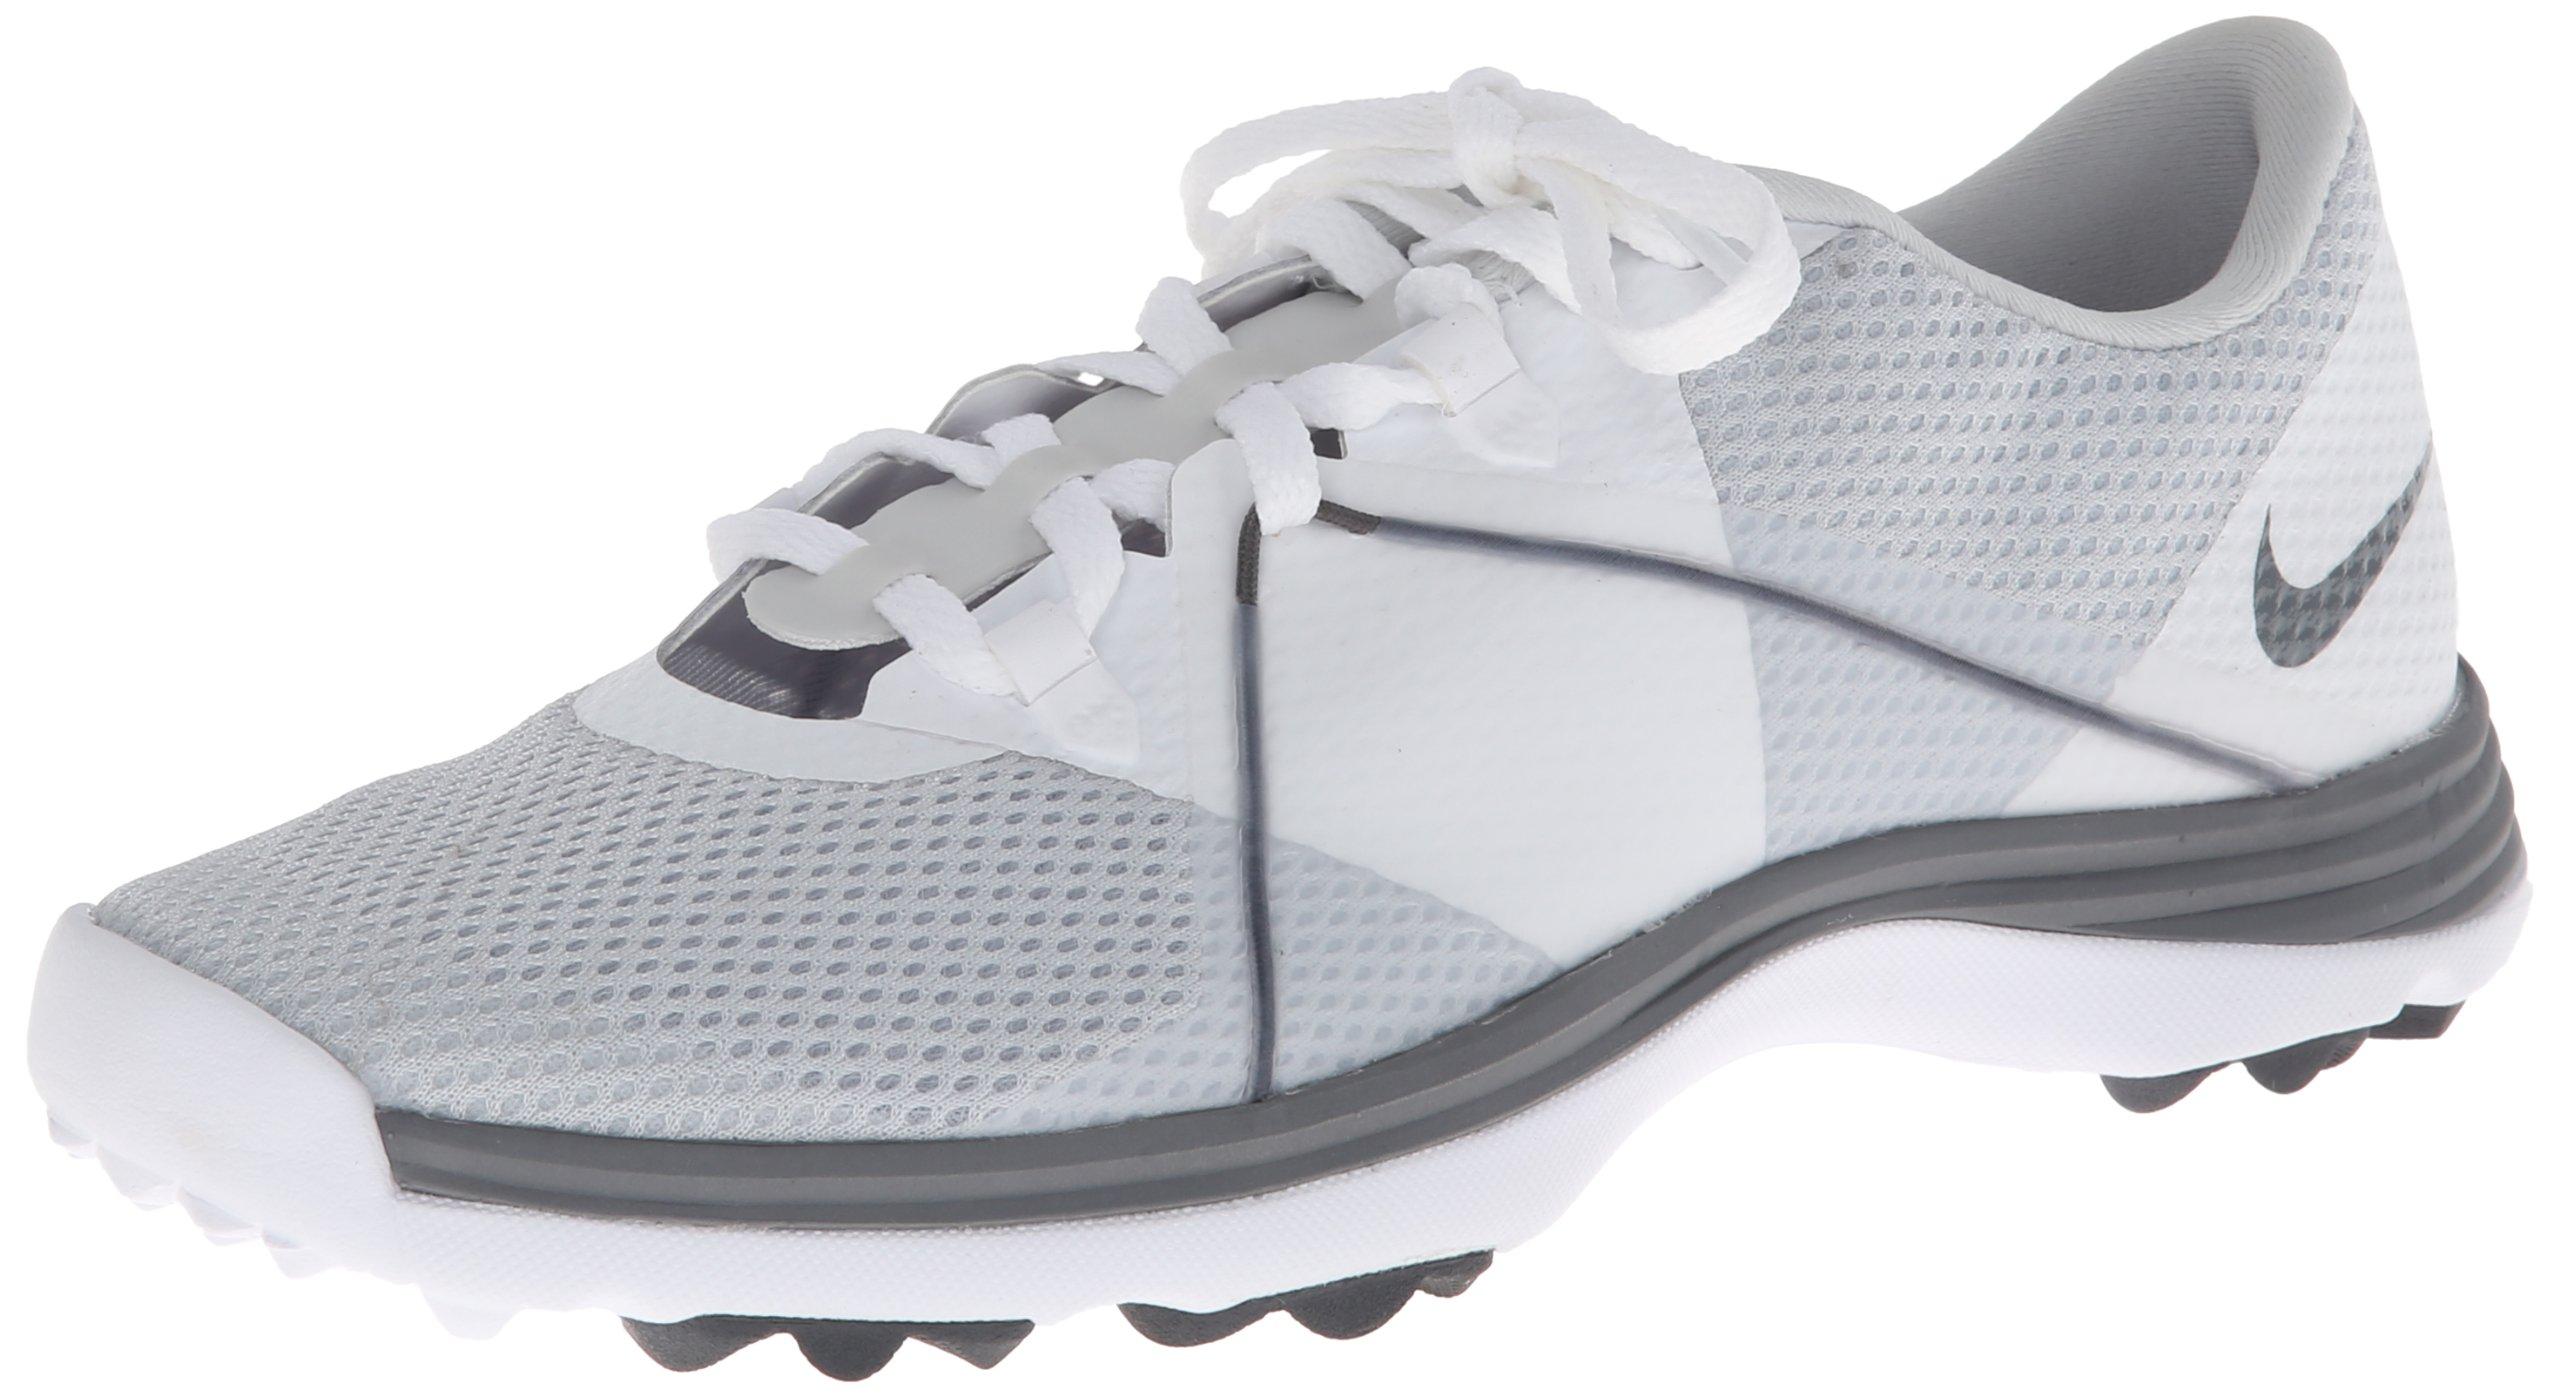 NIKE Golf Women's Lunar Summerlite2 Golf Shoe, Pure Platinum/Cool Grey/White, 7 B(M) US